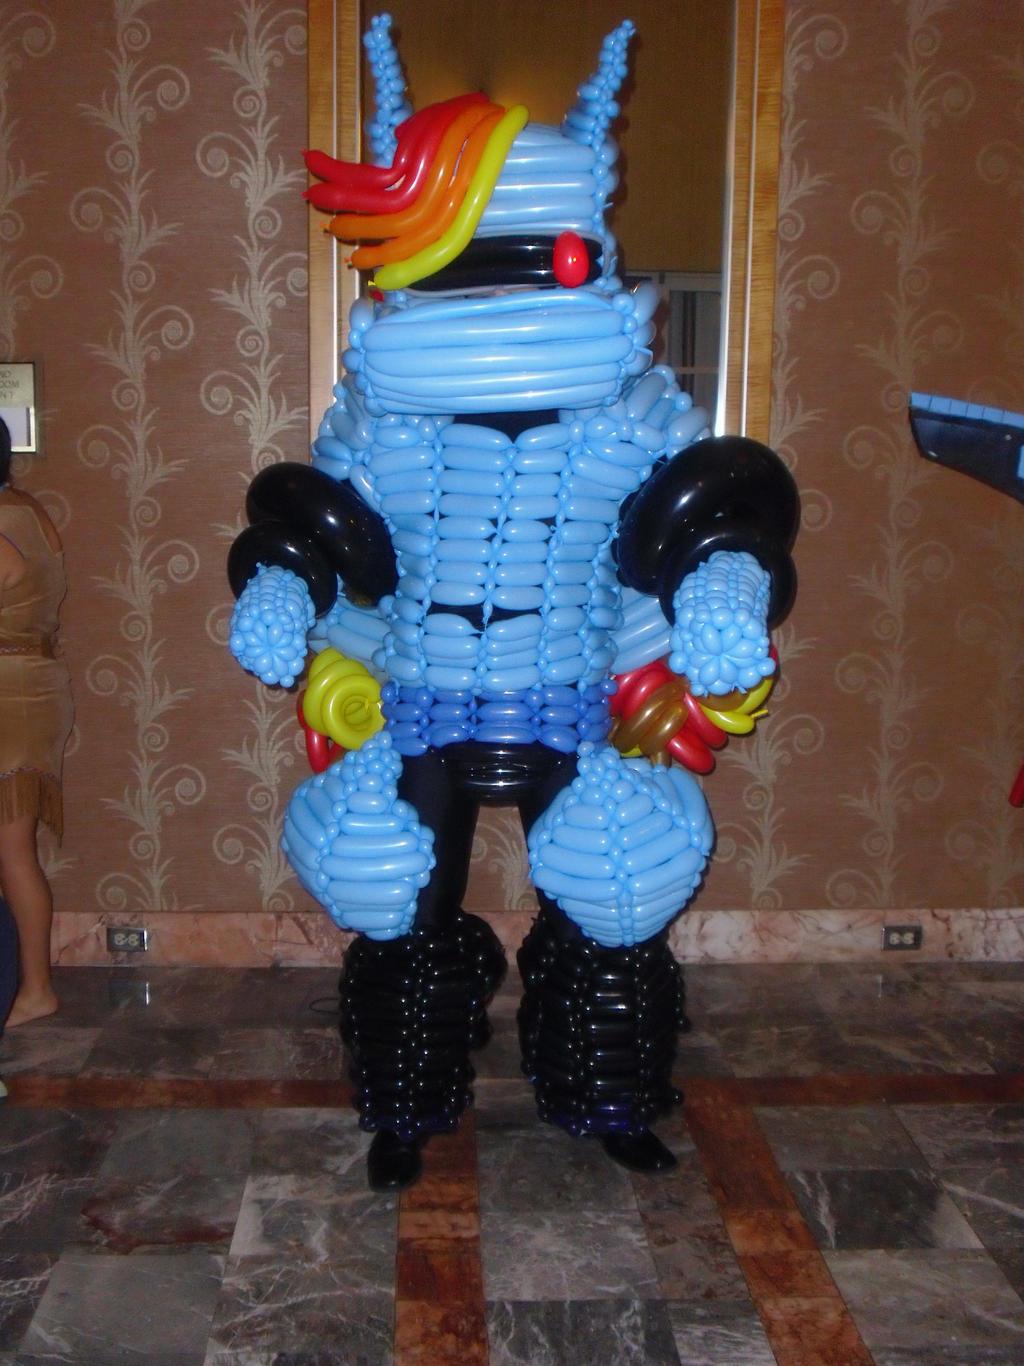 R Dash 5000 Balloon Cosplay